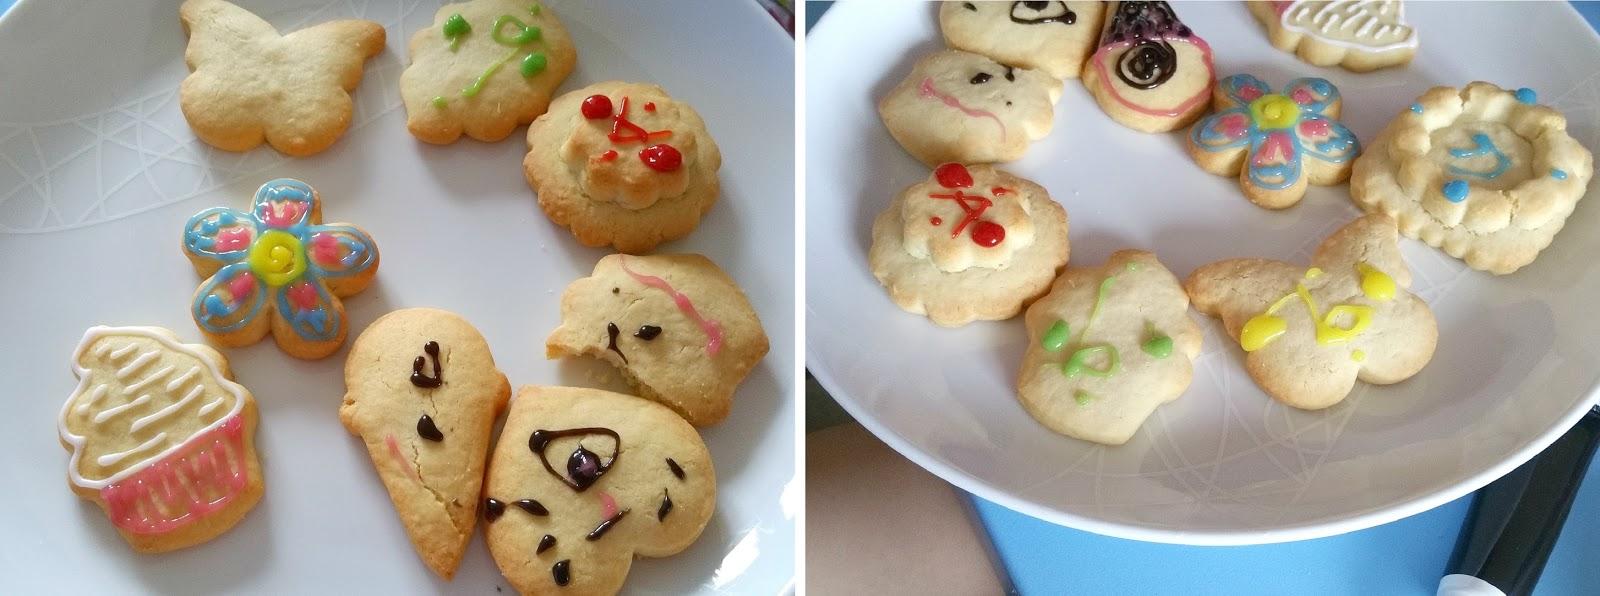 Great British Bake Off, Real Baking Children Baking Set, Iced Cookies